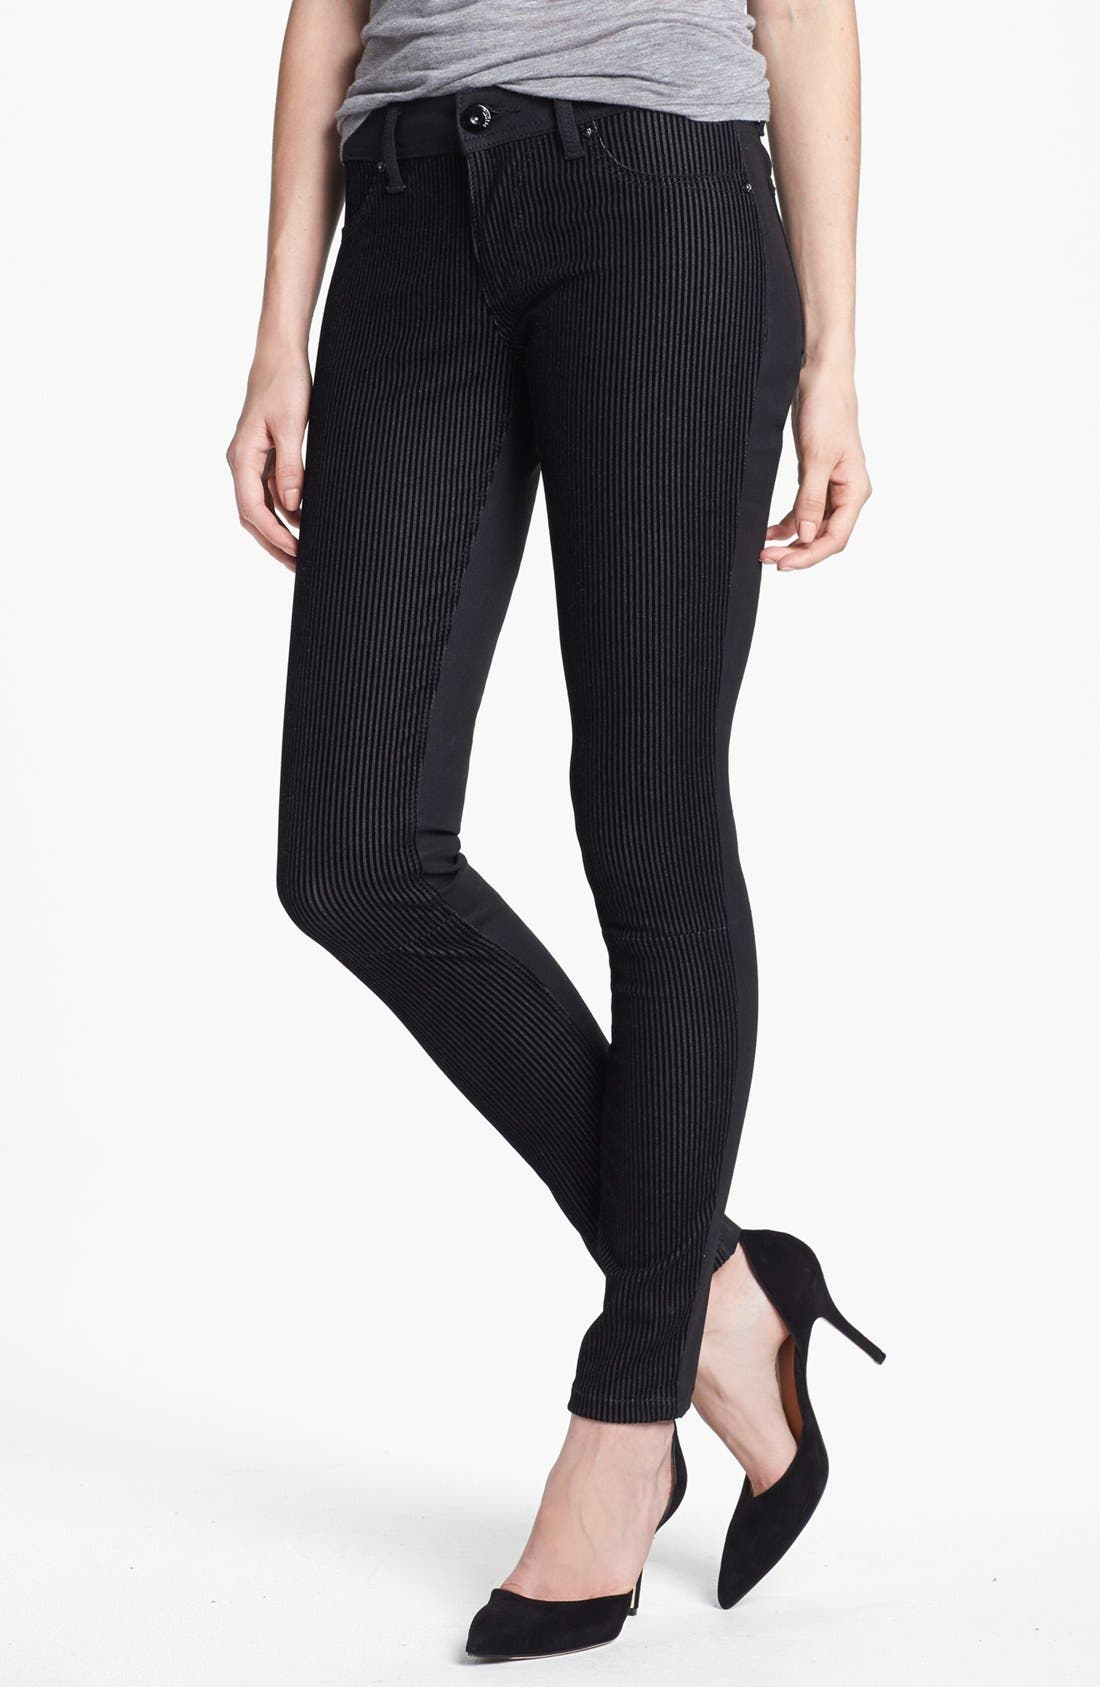 Main Image - DL1961 'Emma' Textured Stripe Skinny Jeans (Pandora)